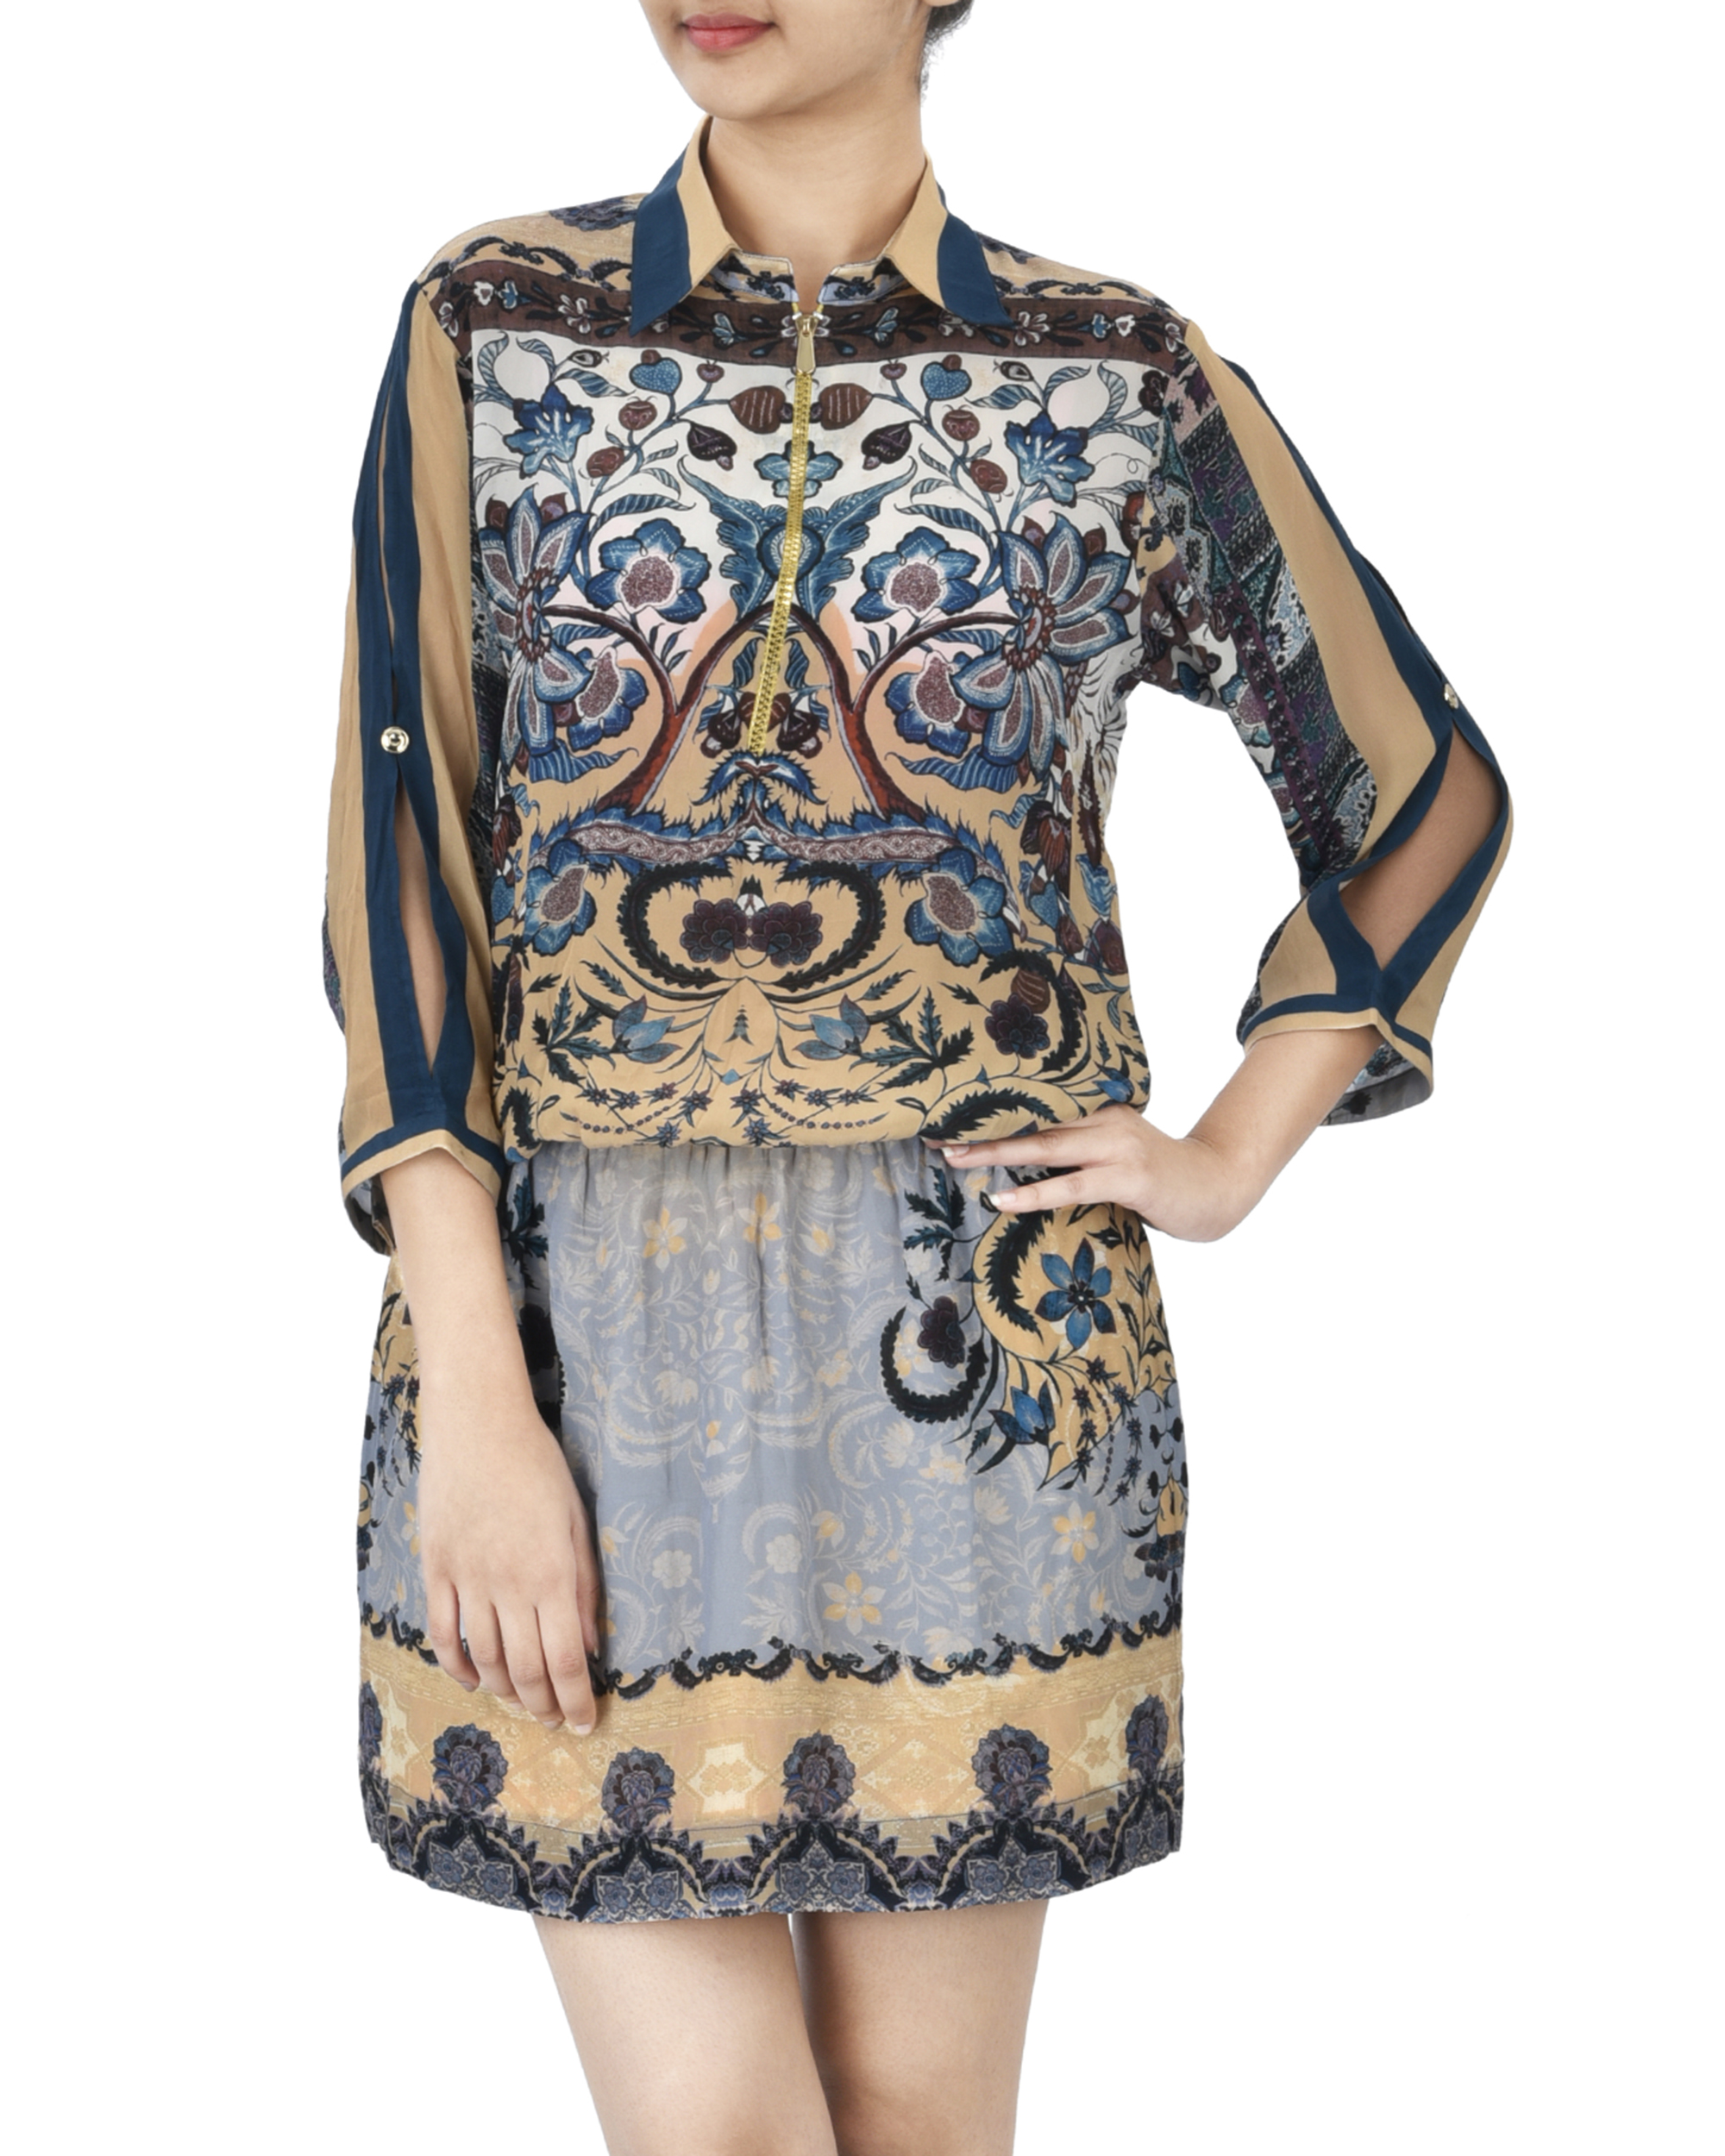 Mosaic print dress